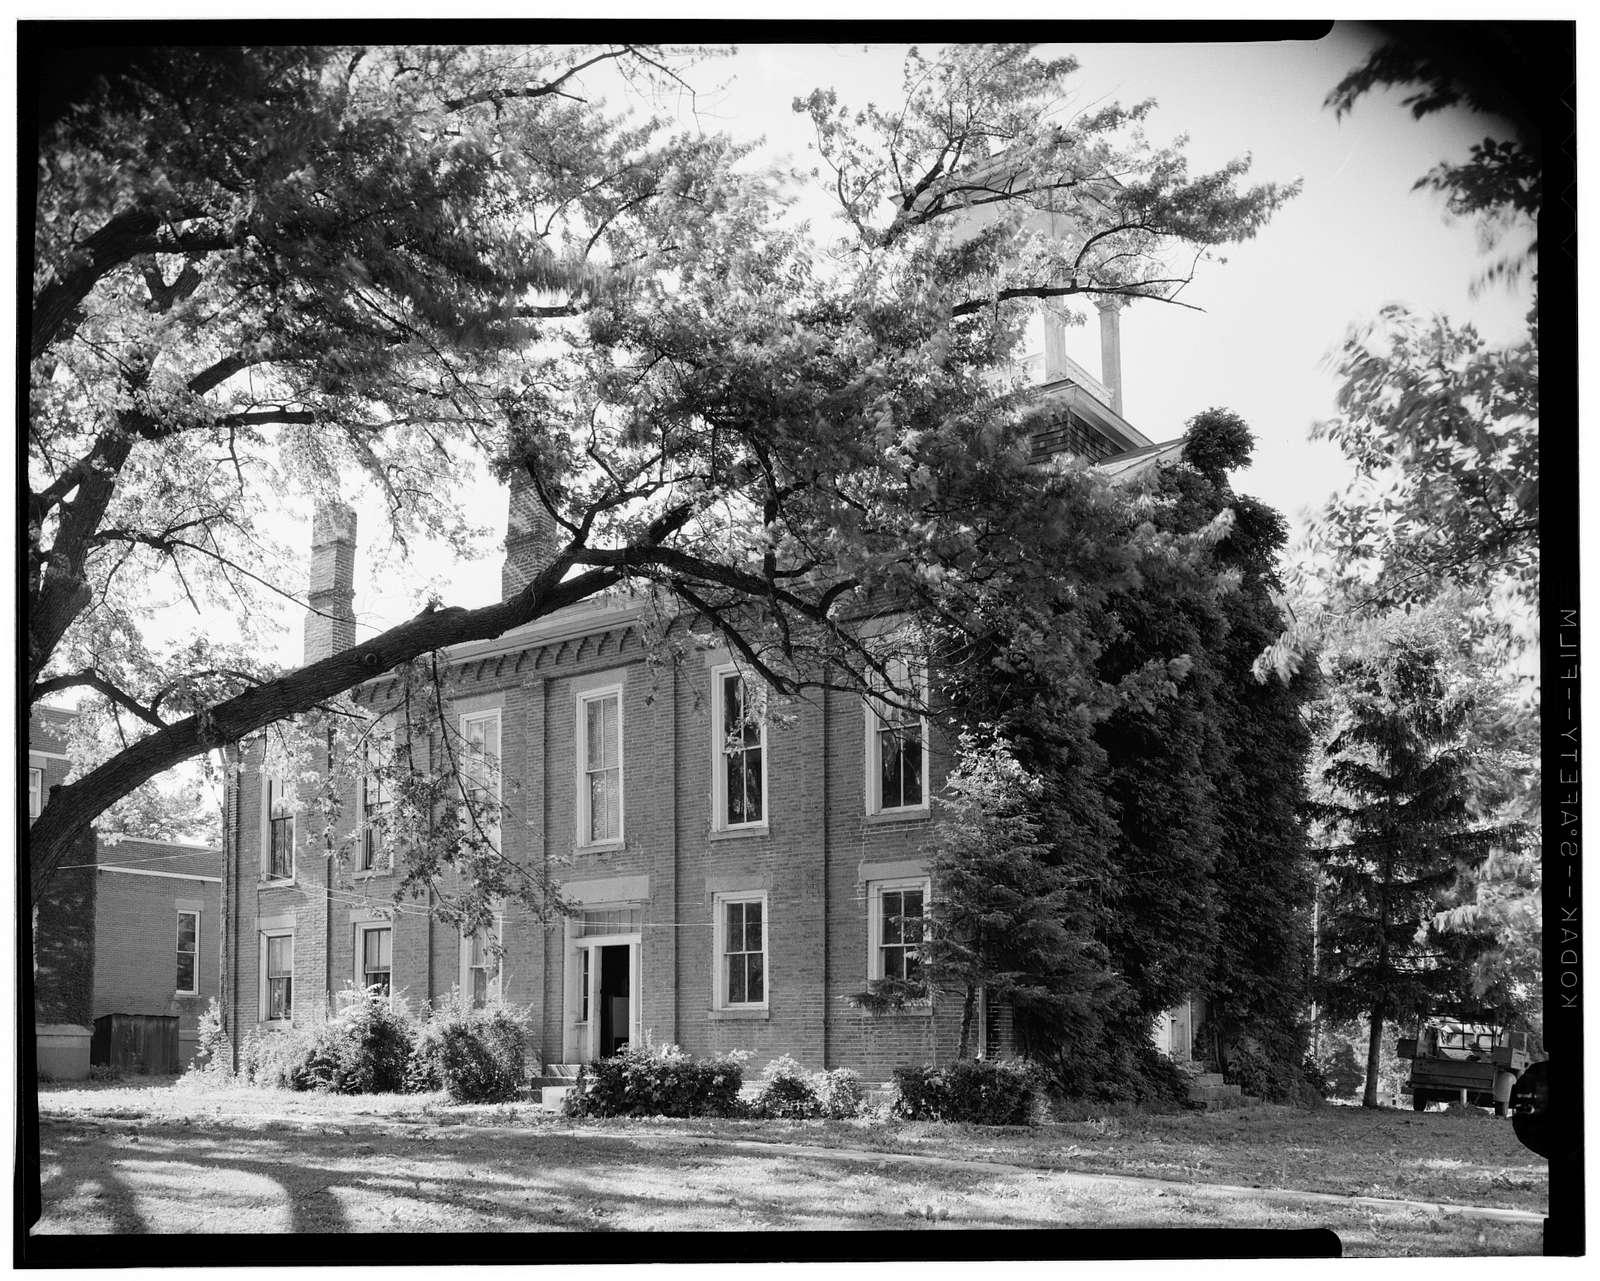 Highland Junior College, Irvin Hall, Highland Junior College Campus, Highland, Doniphan County, KS